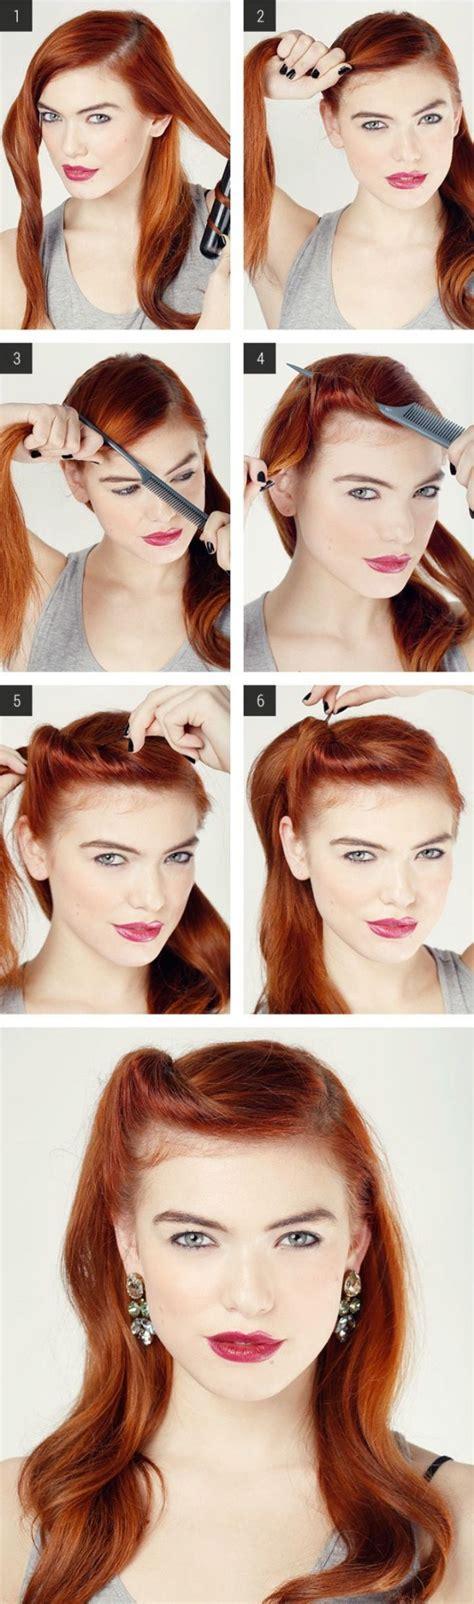 how to do vintage hairstyles pinterest 10 tutoriales paso a paso de peinados f 225 ciles y r 225 pidos